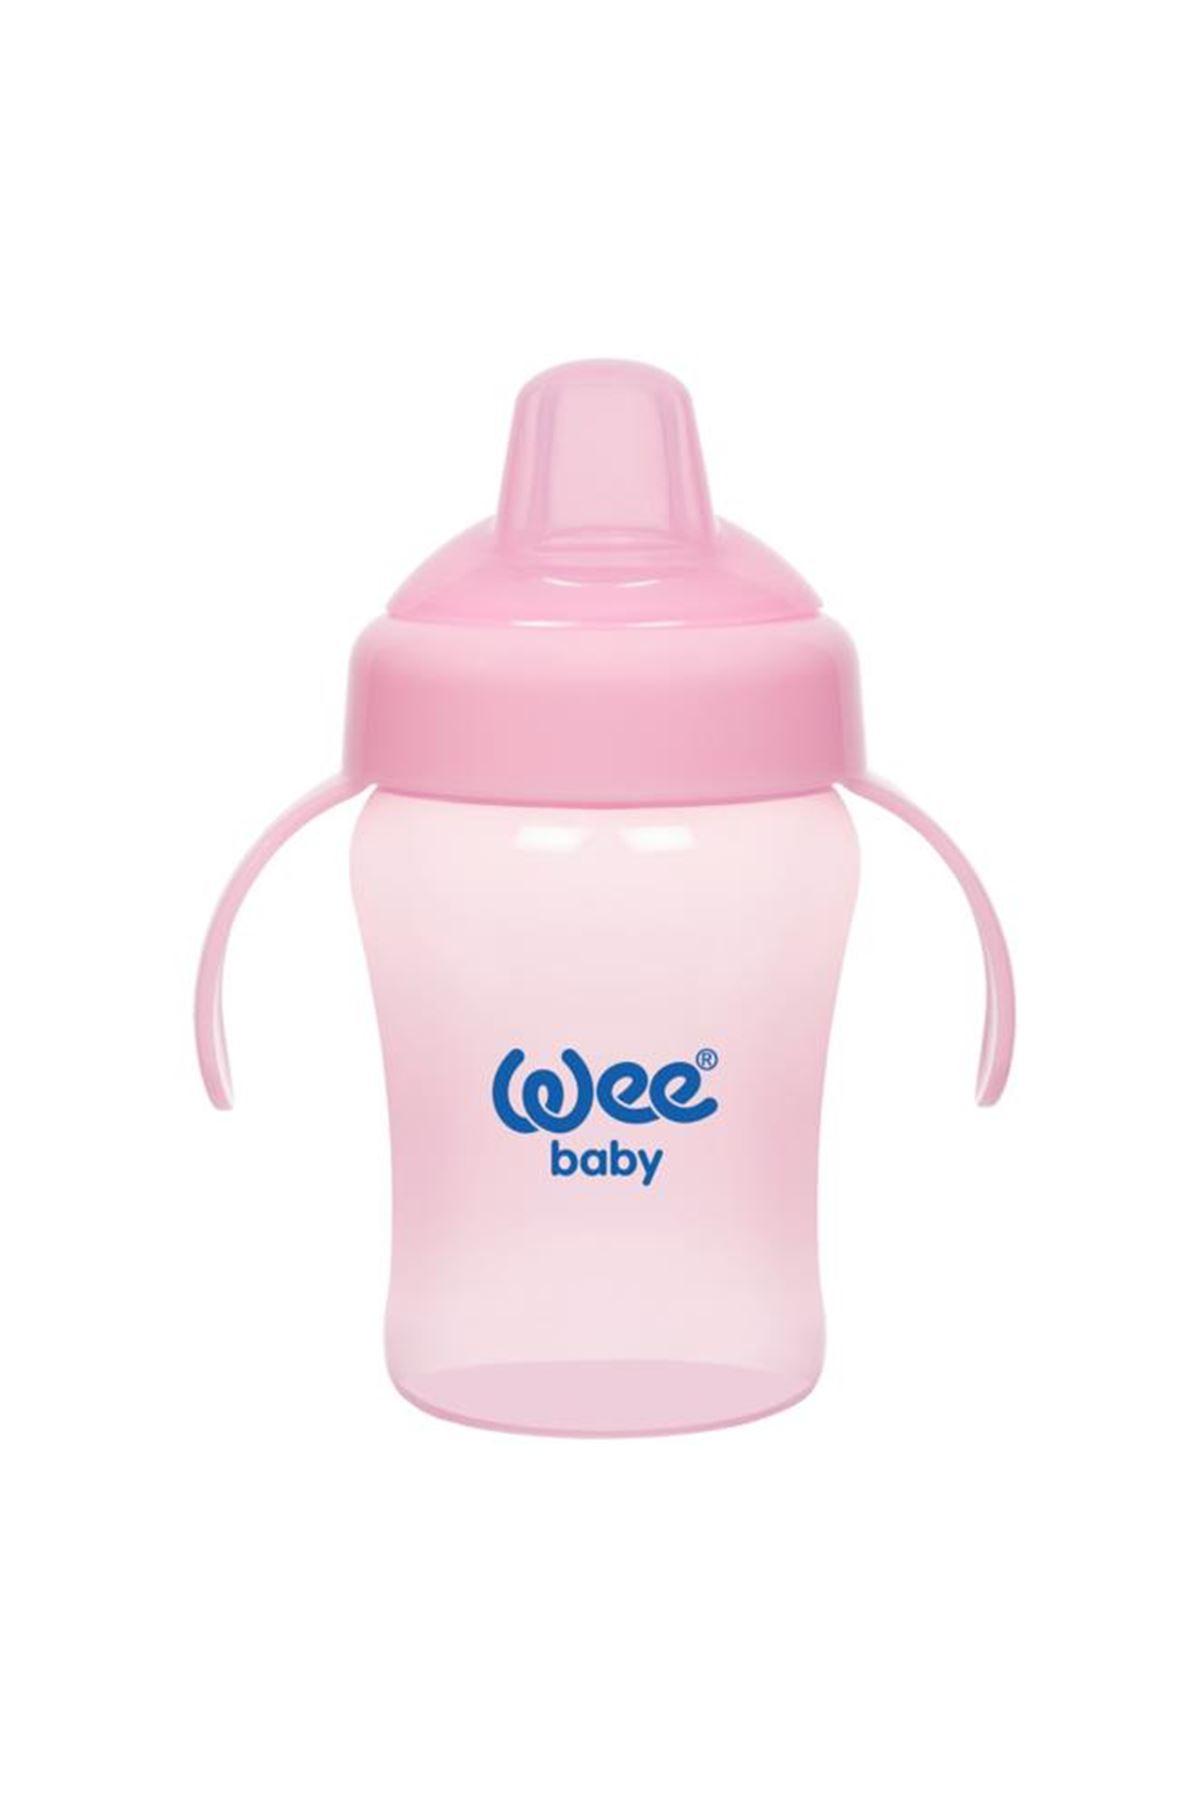 Wee Baby Colorful Akıtmaz Kulplu Bardak 240 ml 775